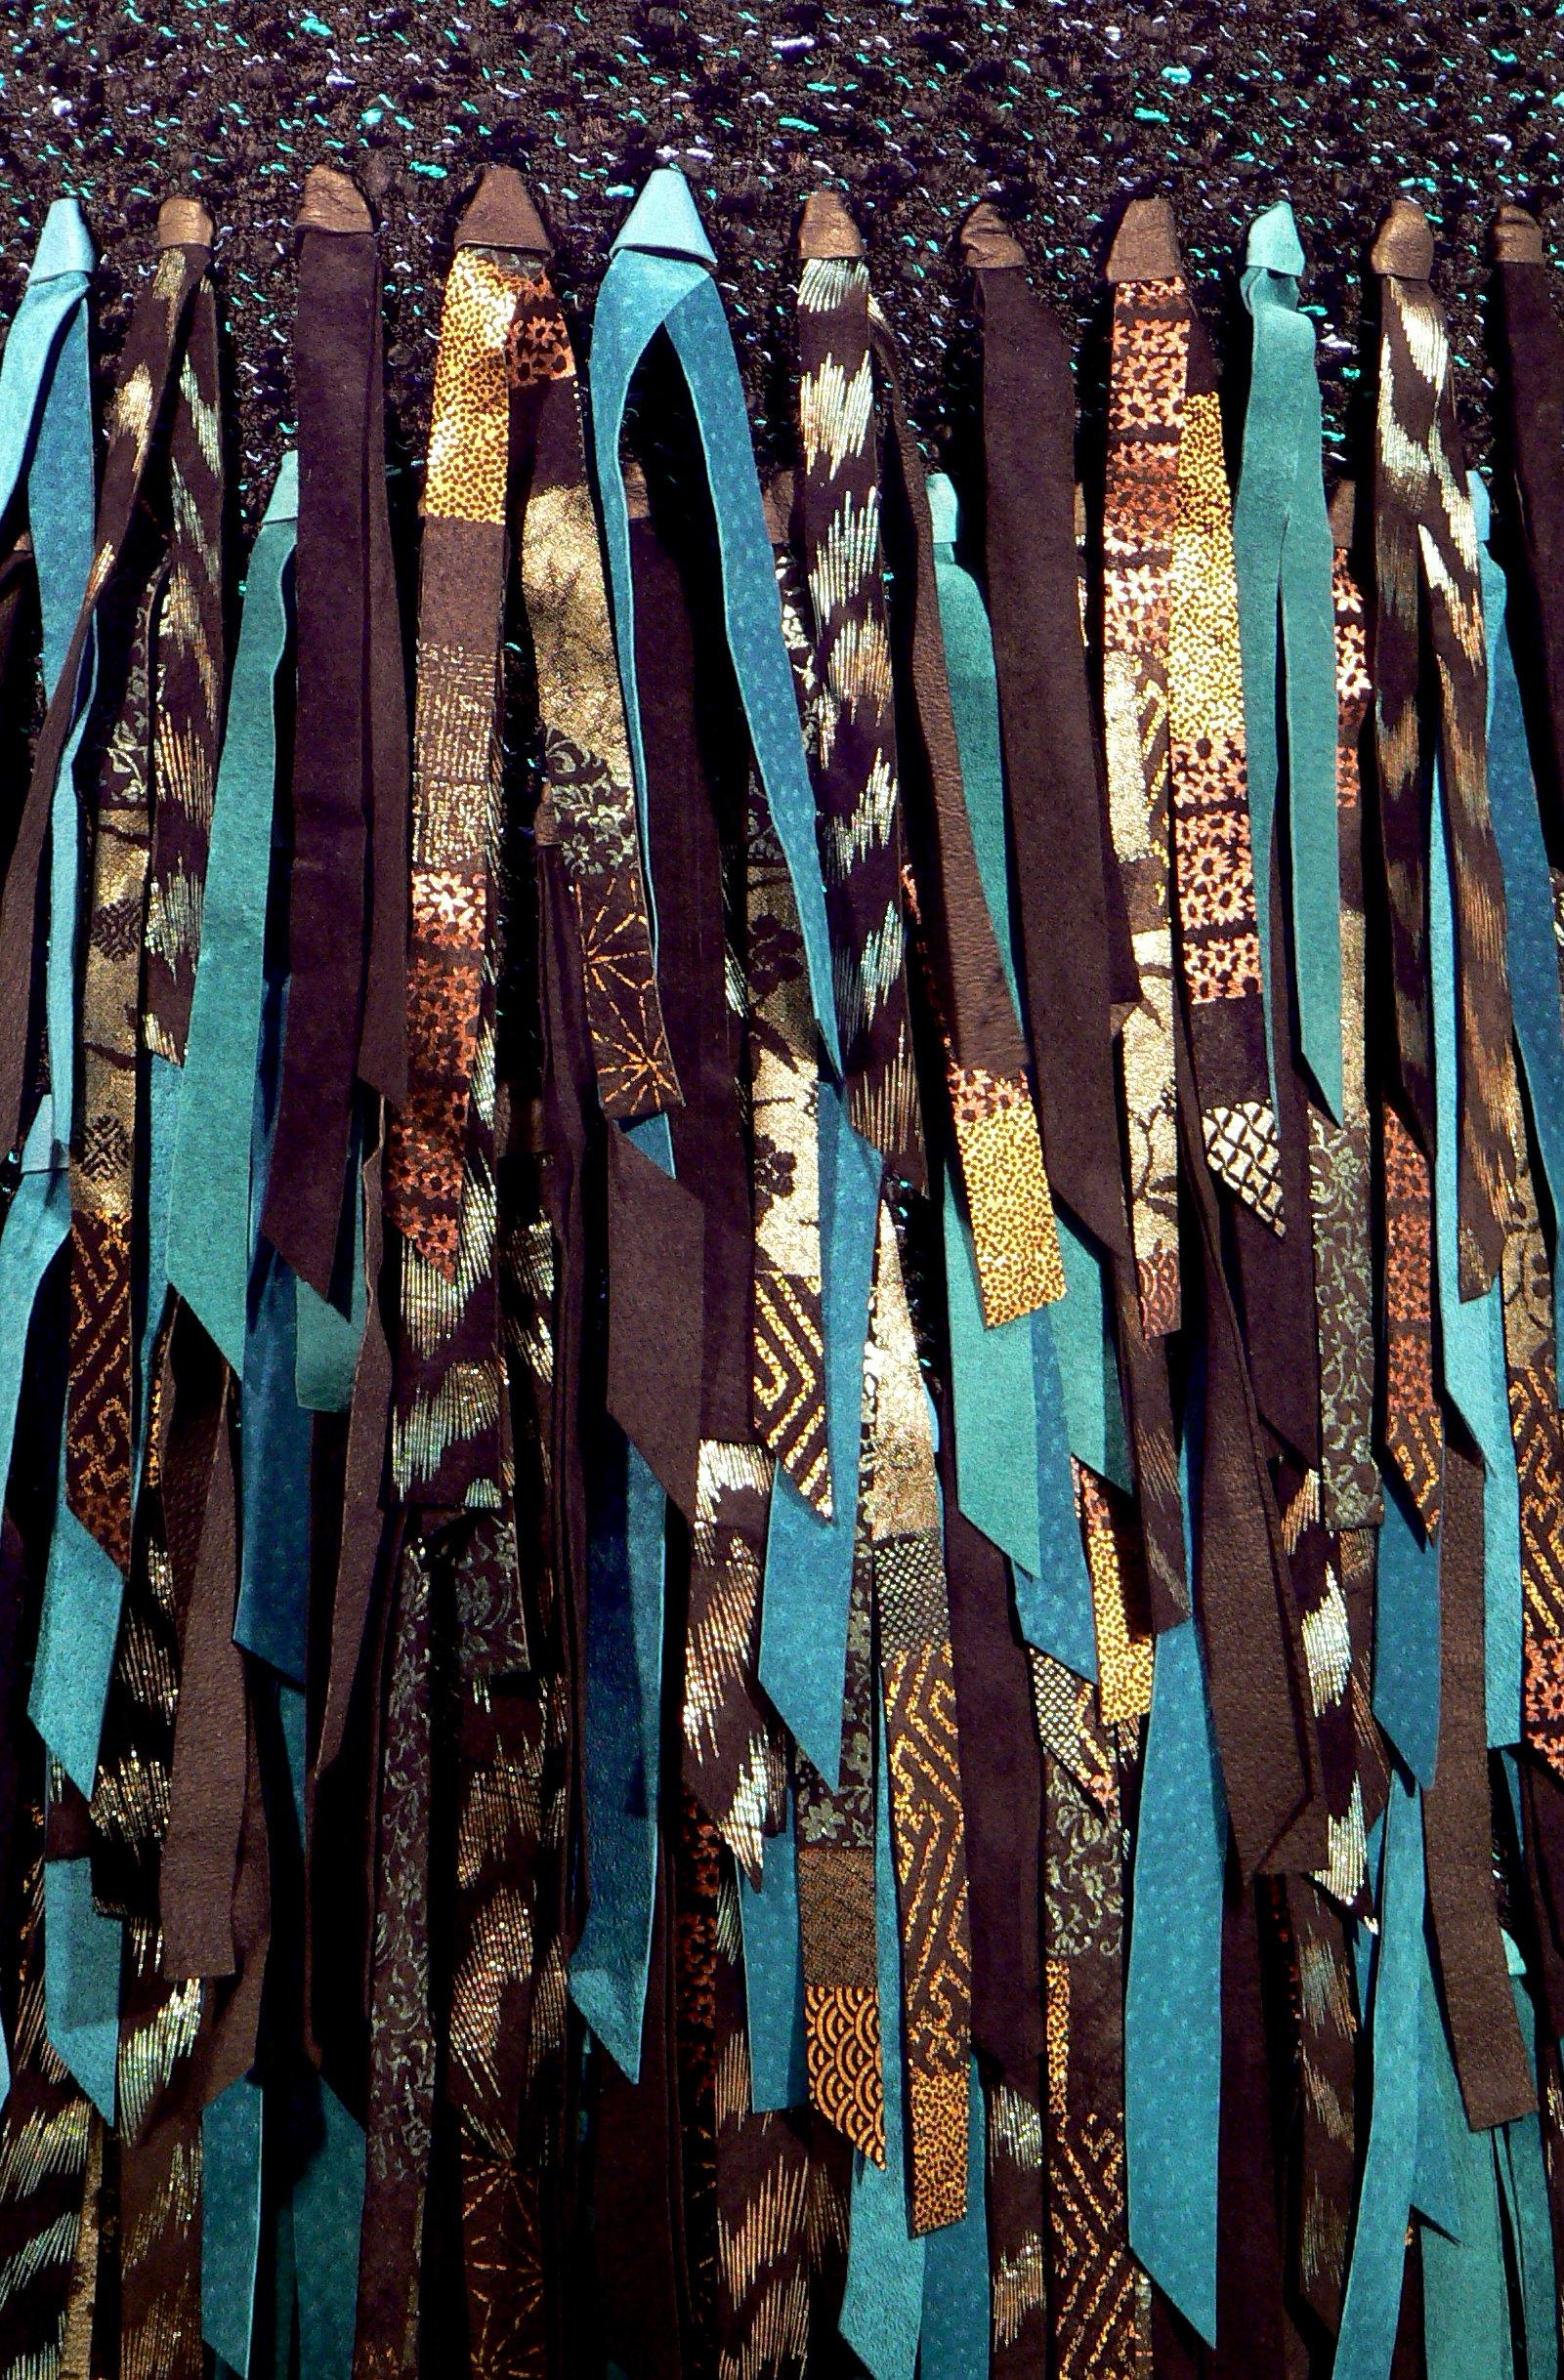 Leather Skirt K Weir-West 4.JPG